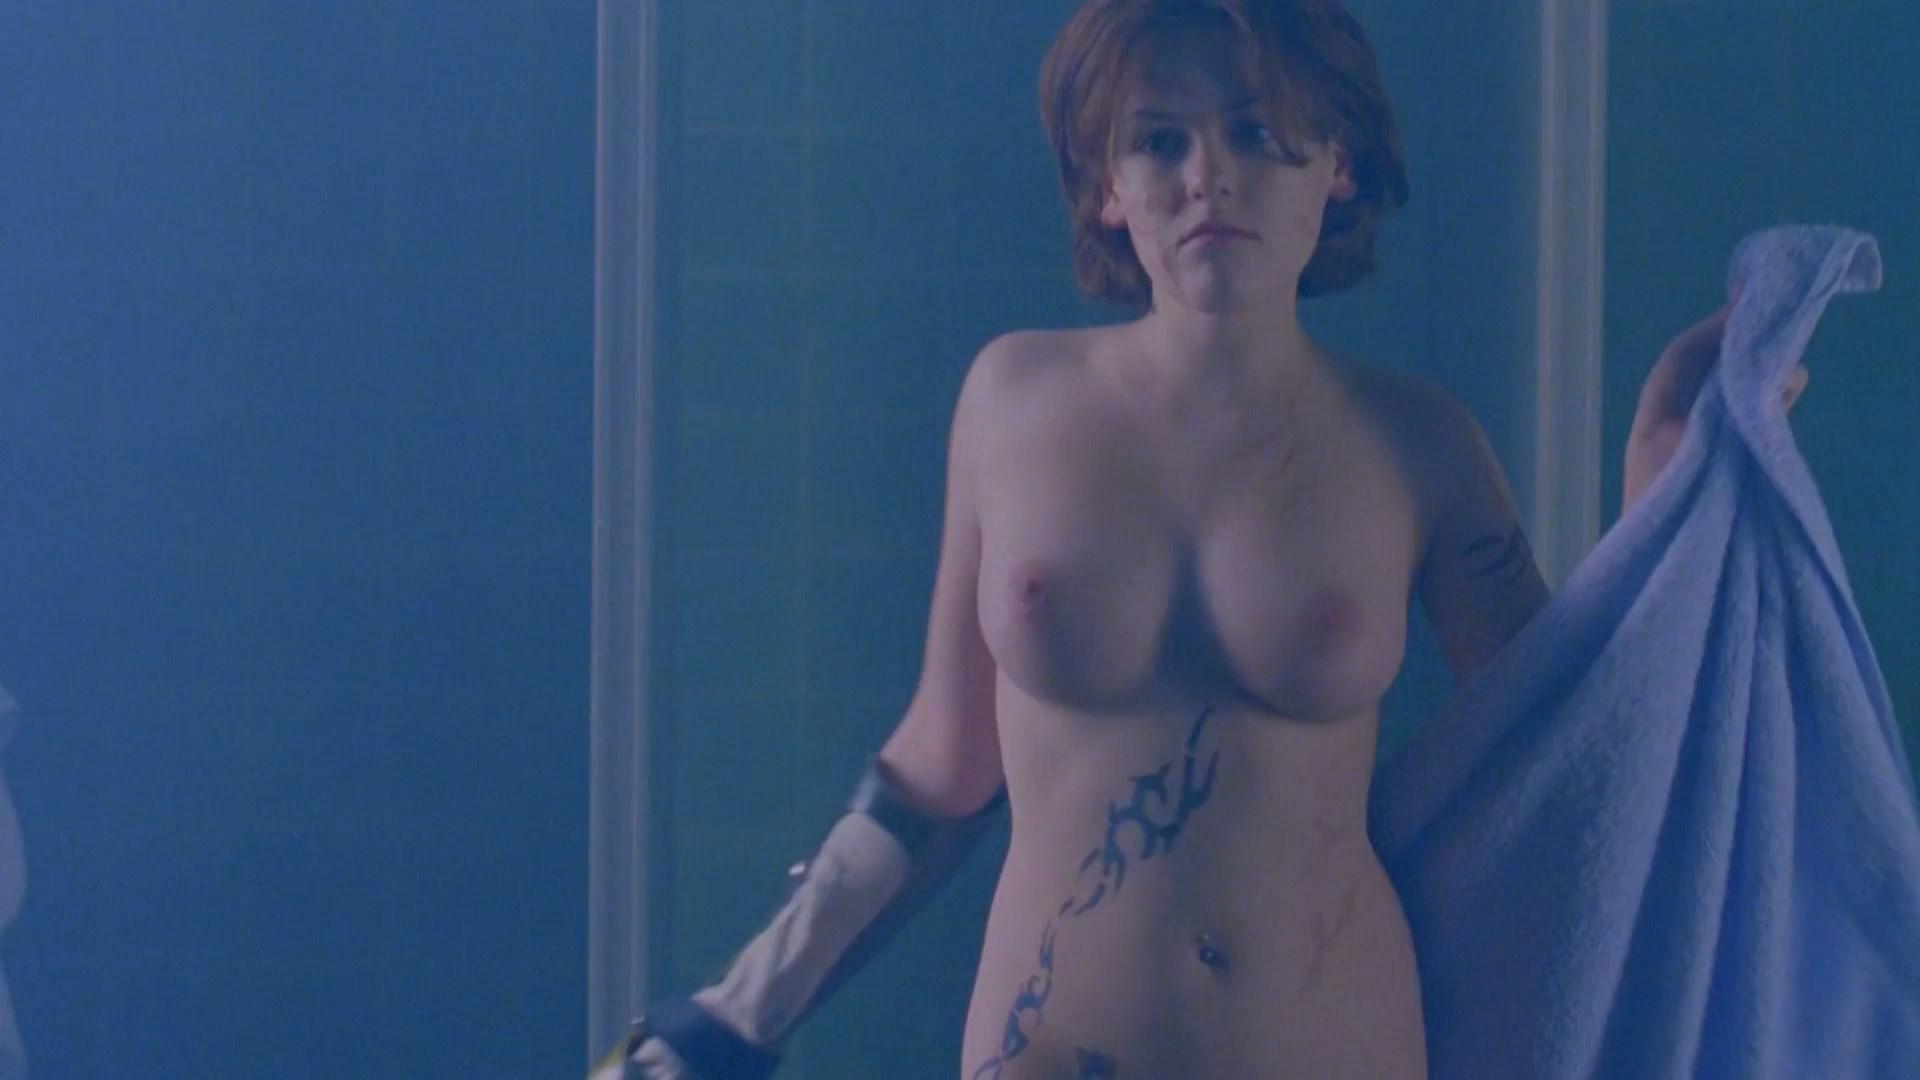 Natasha lyonn nude